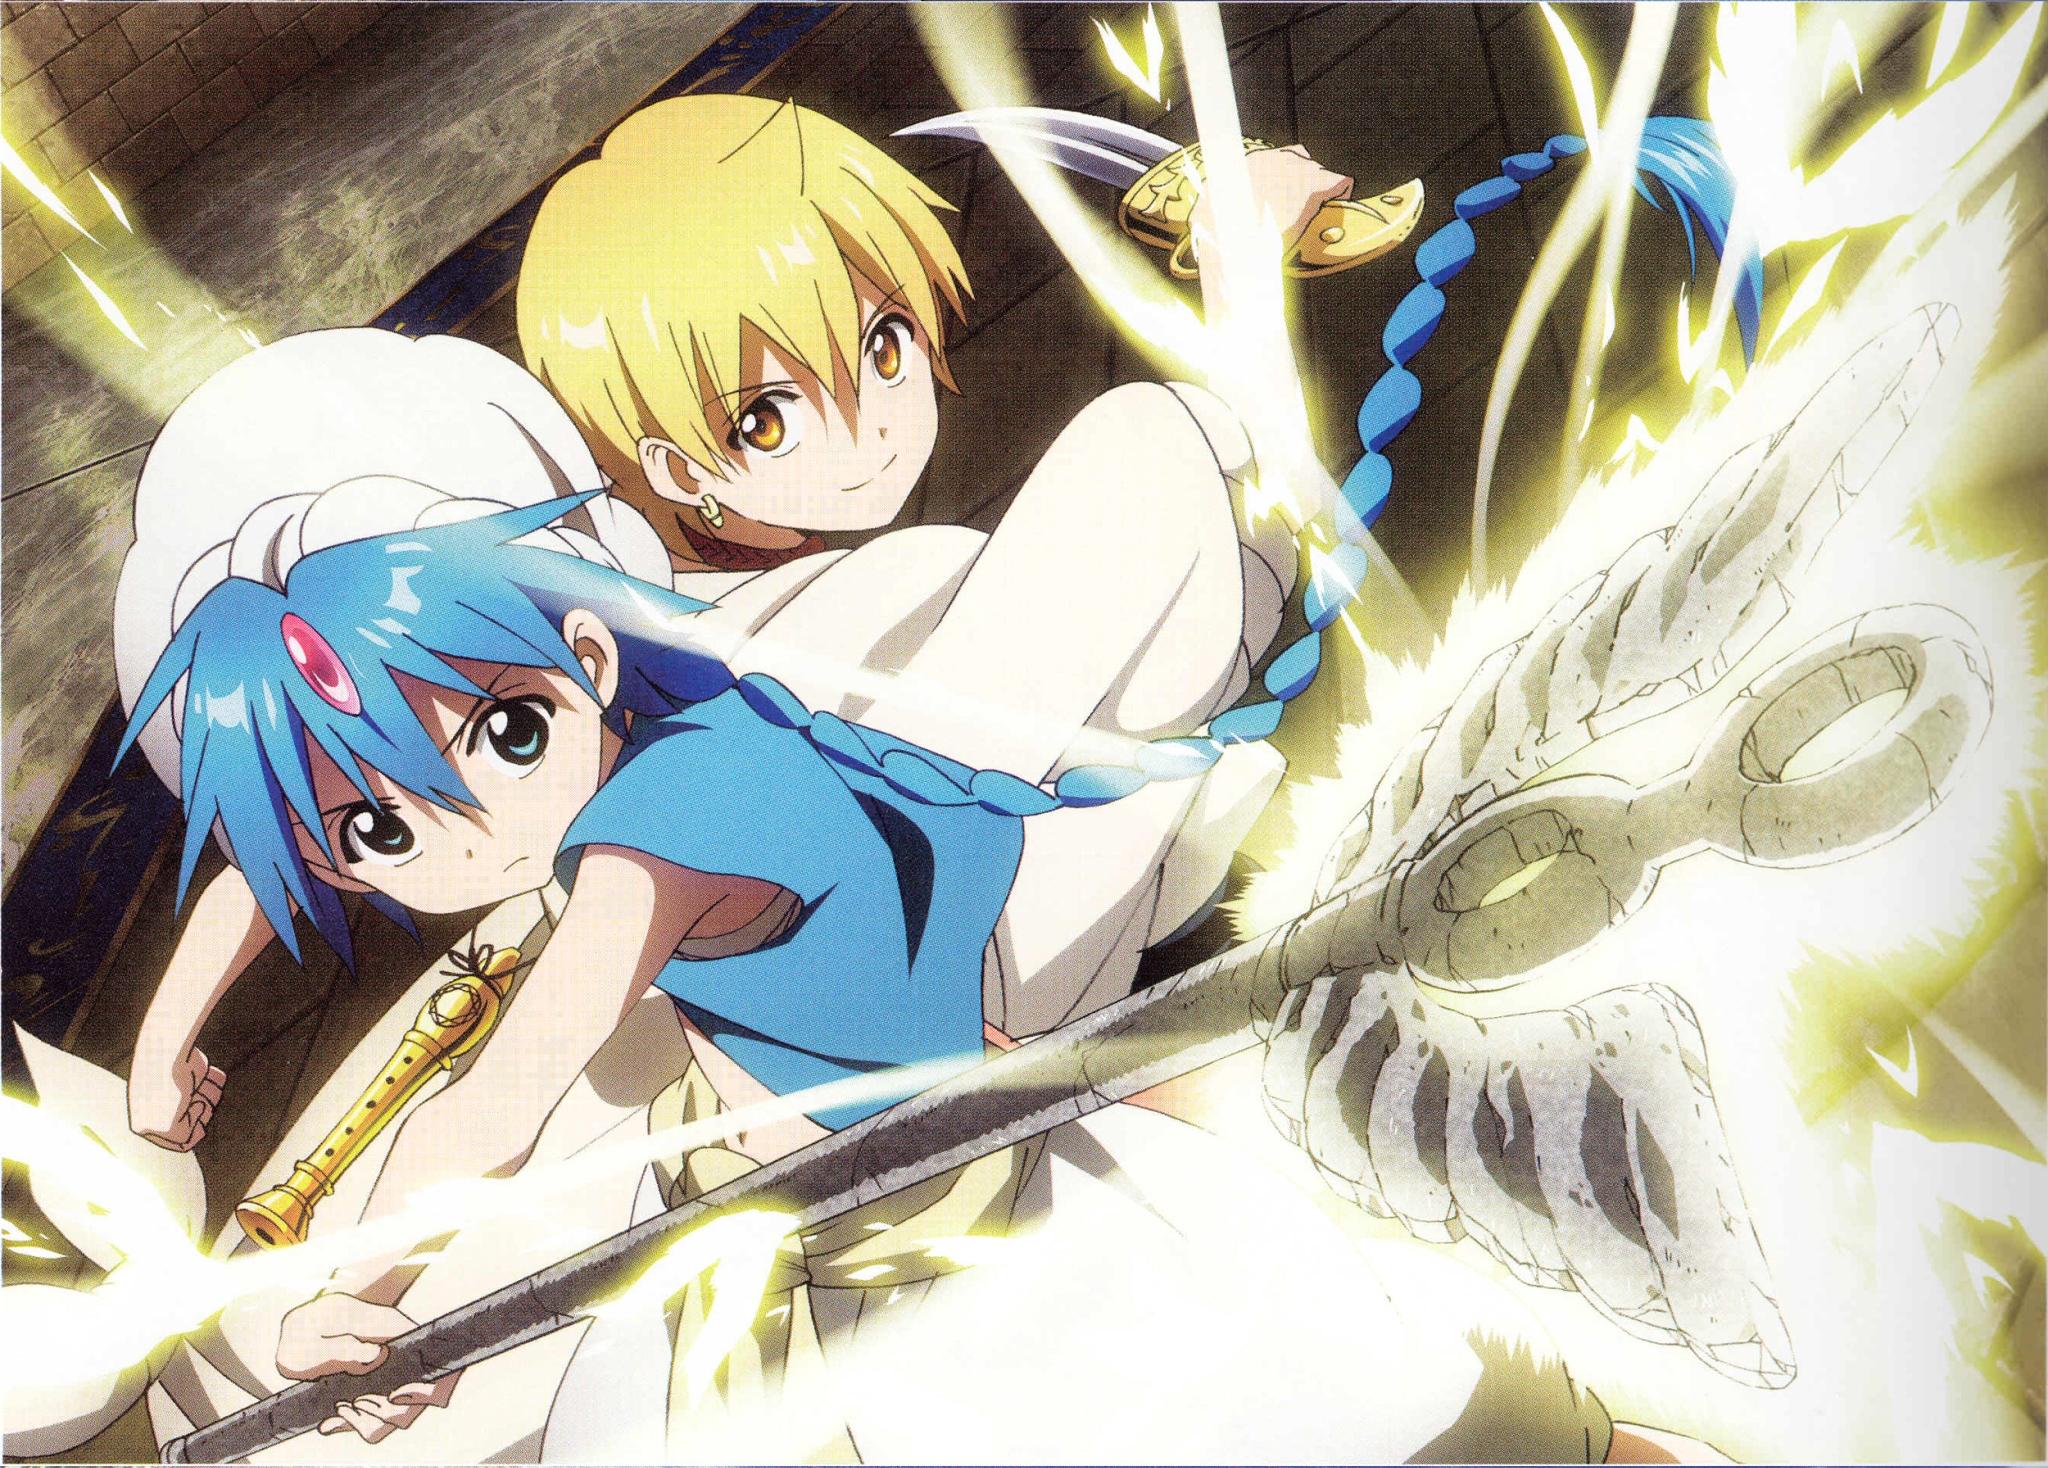 Magi The Labyrinth Of Magic Wallpapers Anime Hq Magi The